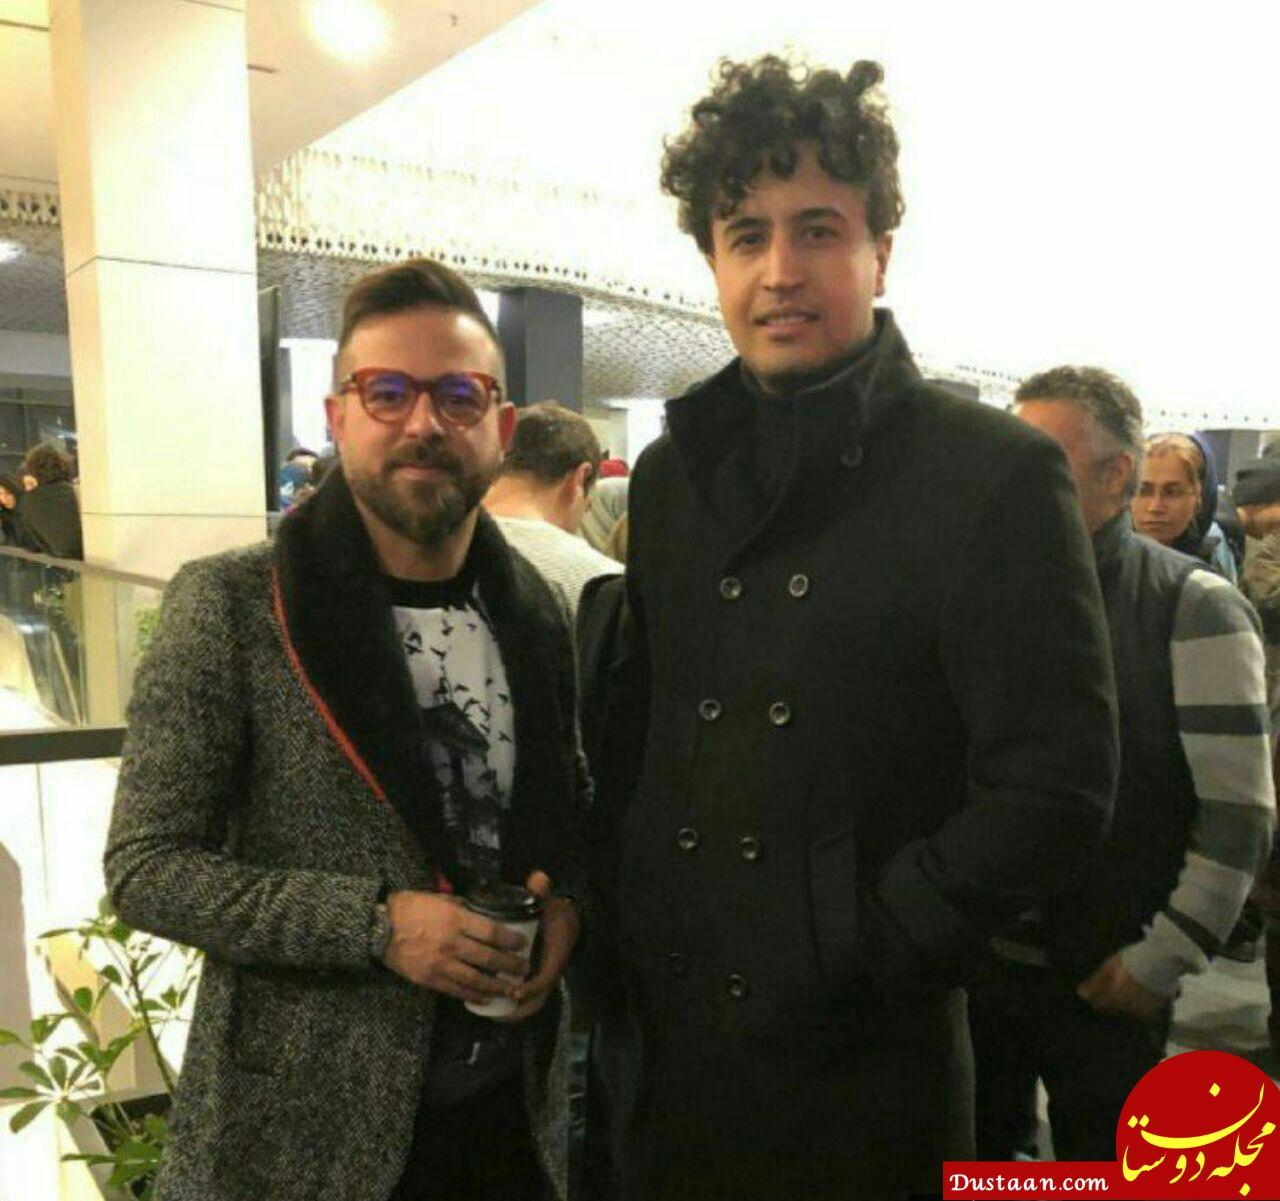 www.dustaan.com ظاهر متفاوت مهرداد صدیقیان در مراسم اکران پل خواب +عکس